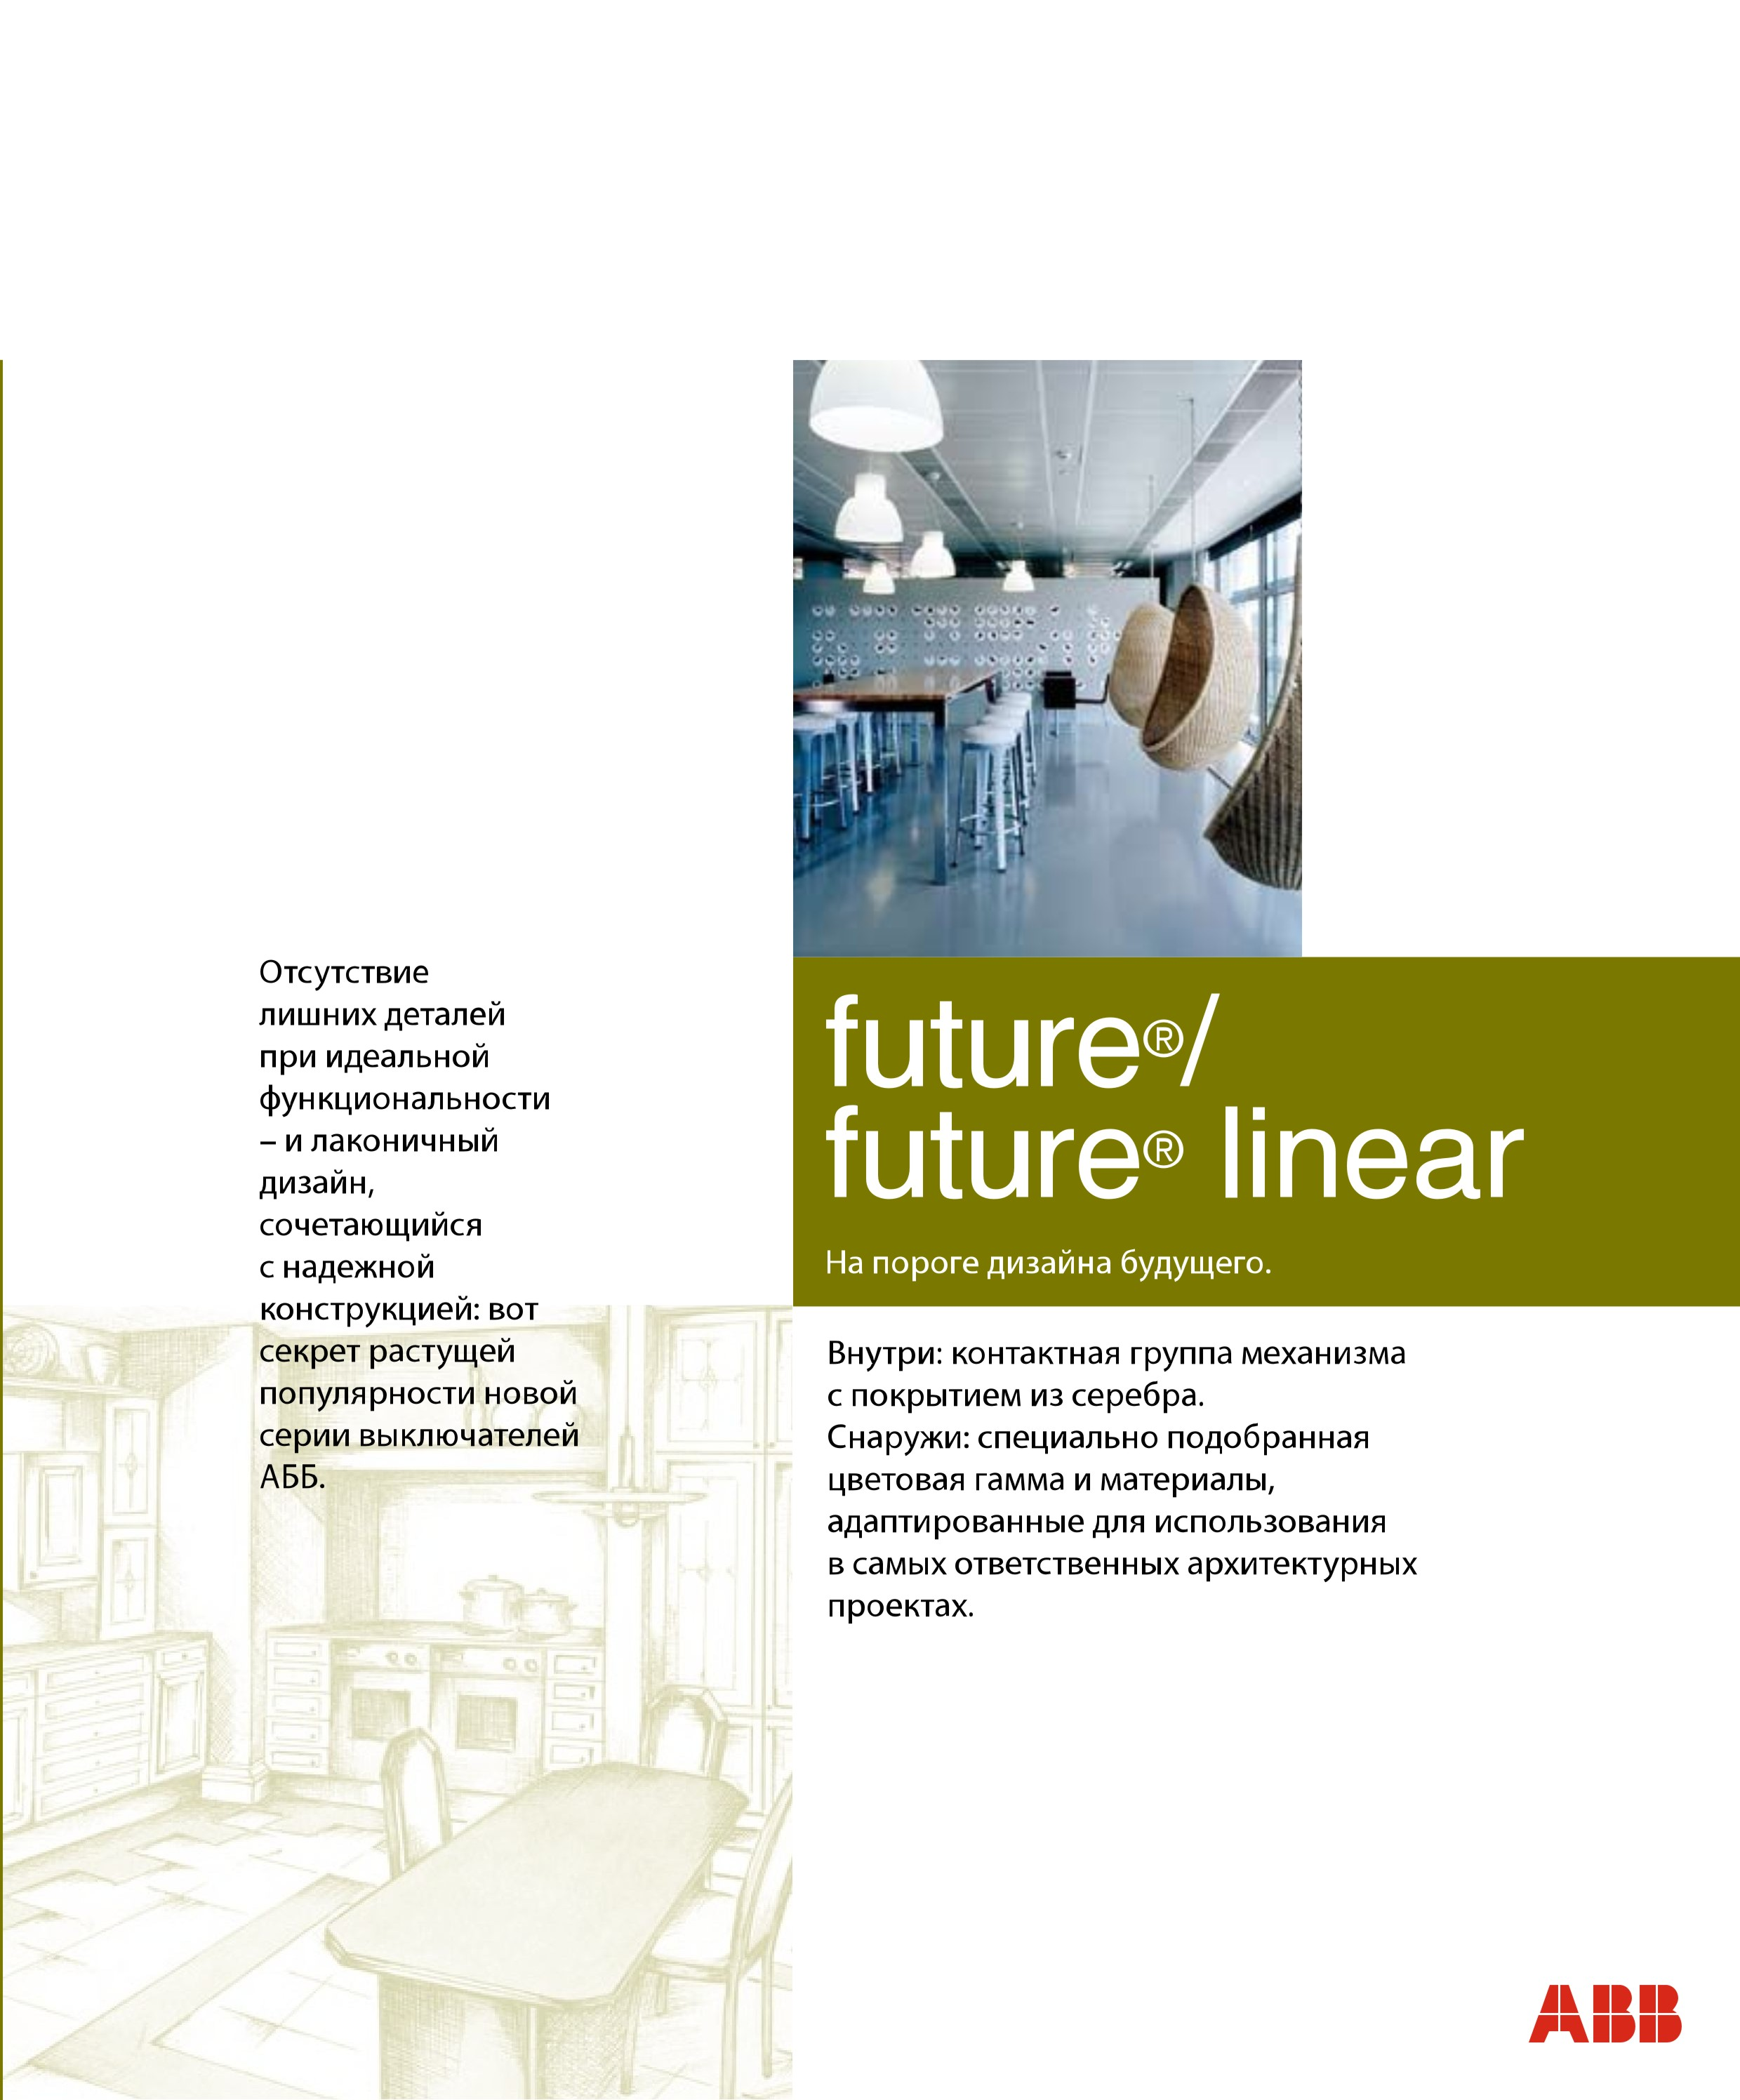 Future linear